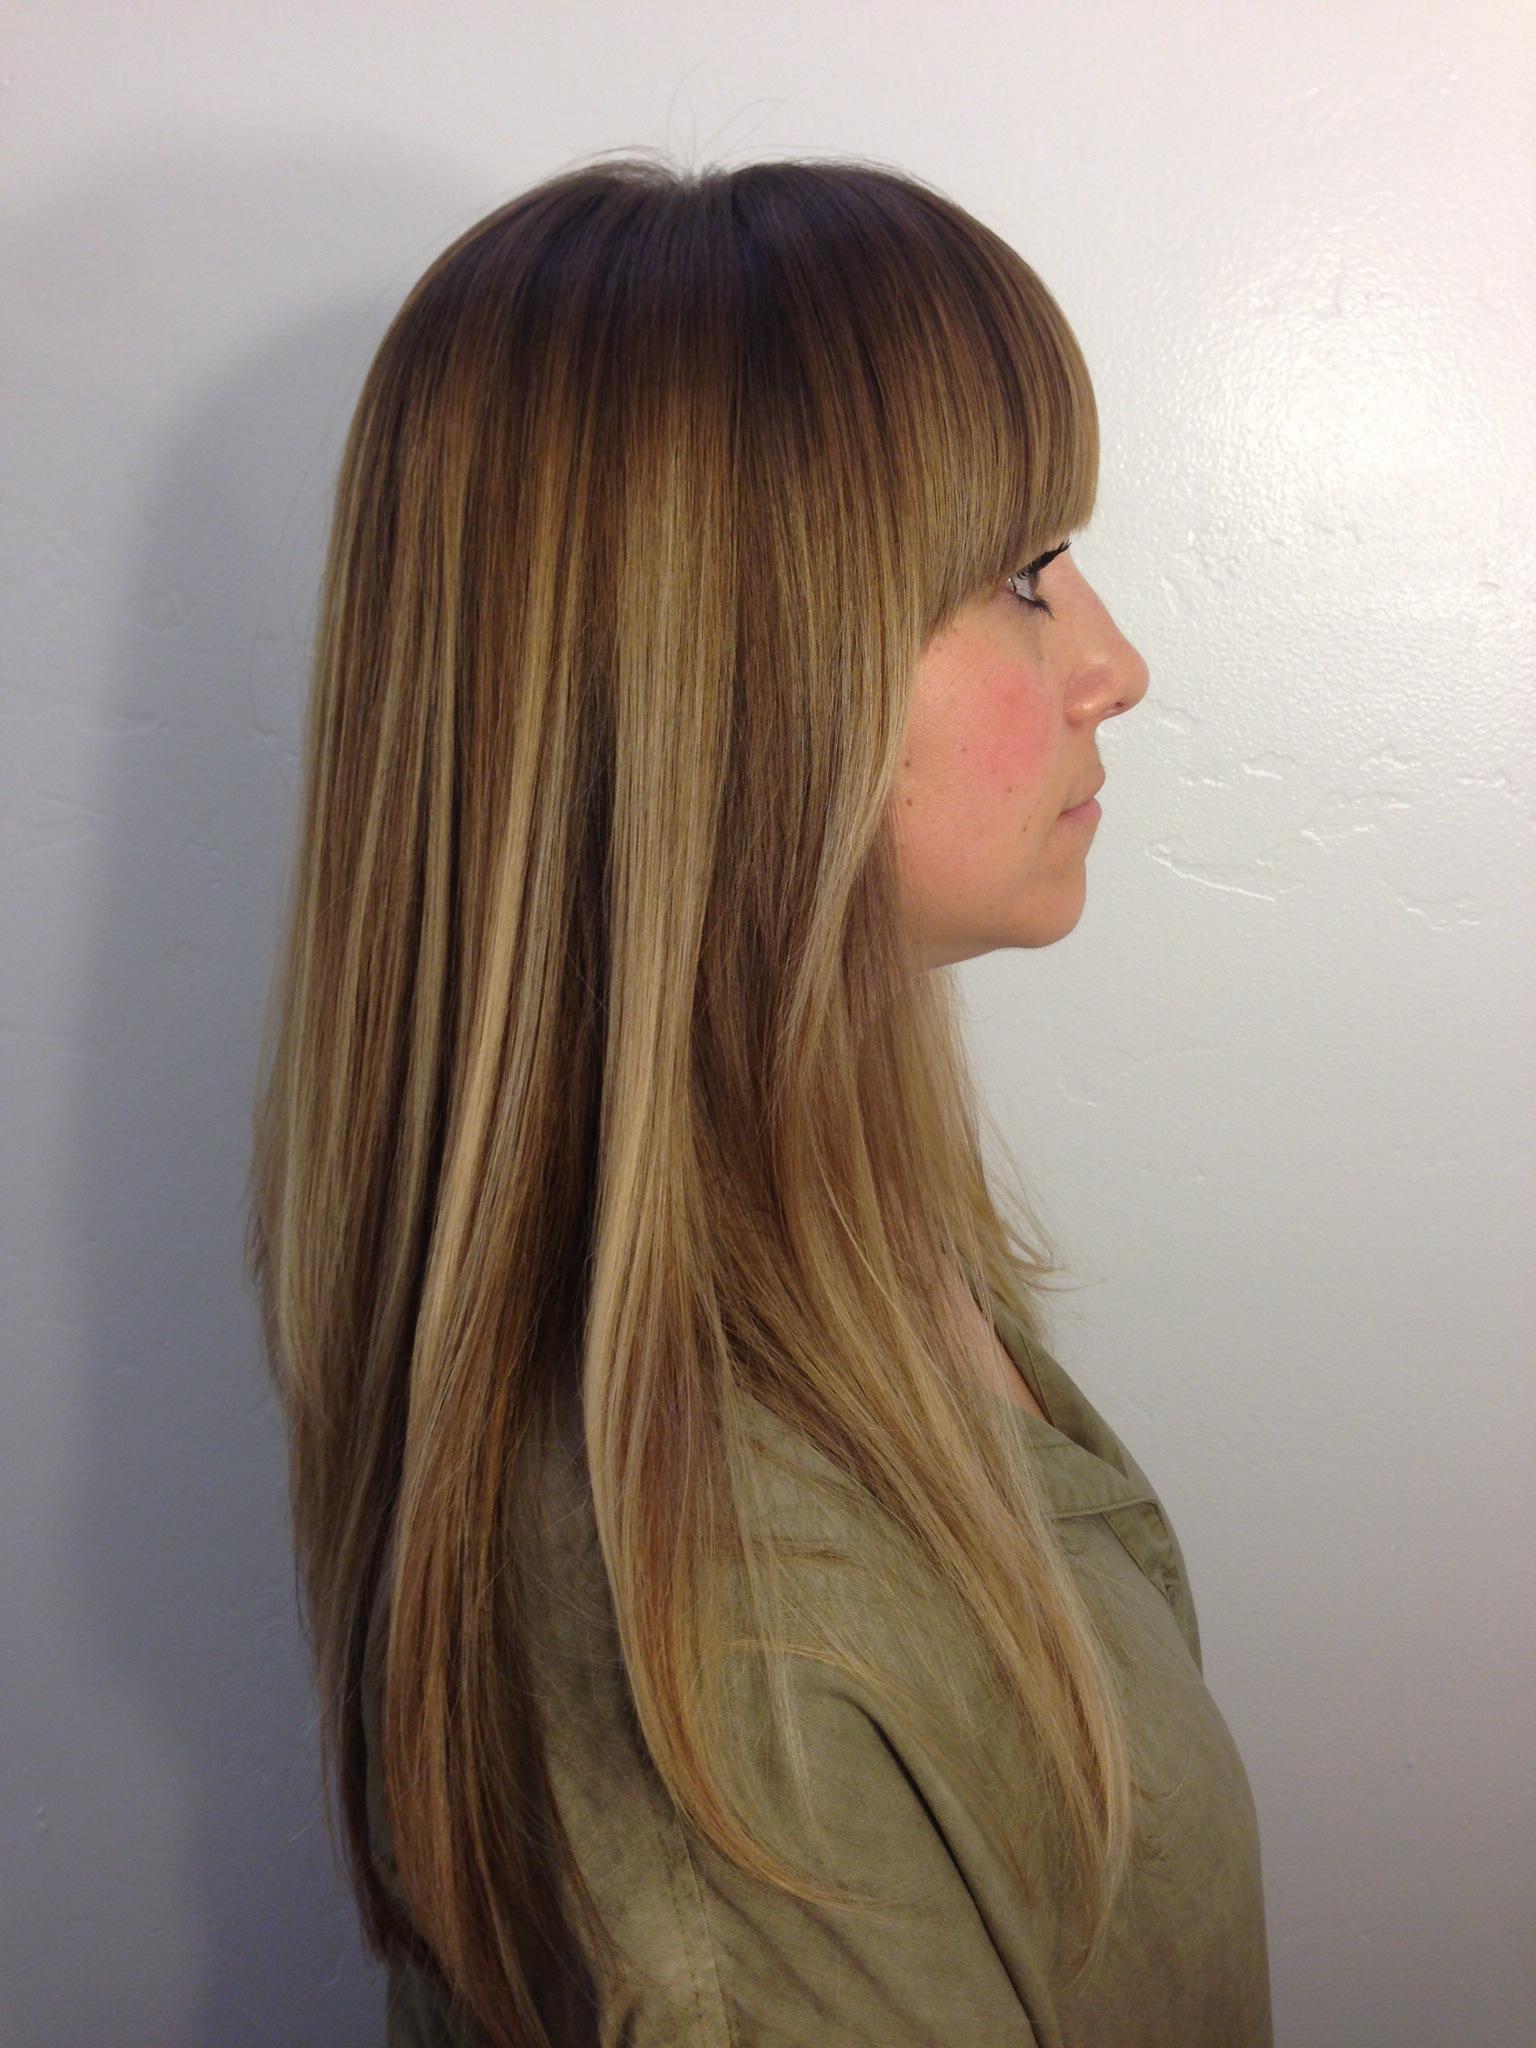 San Diego Blonde Highlights Specialist Andrea Lefevre